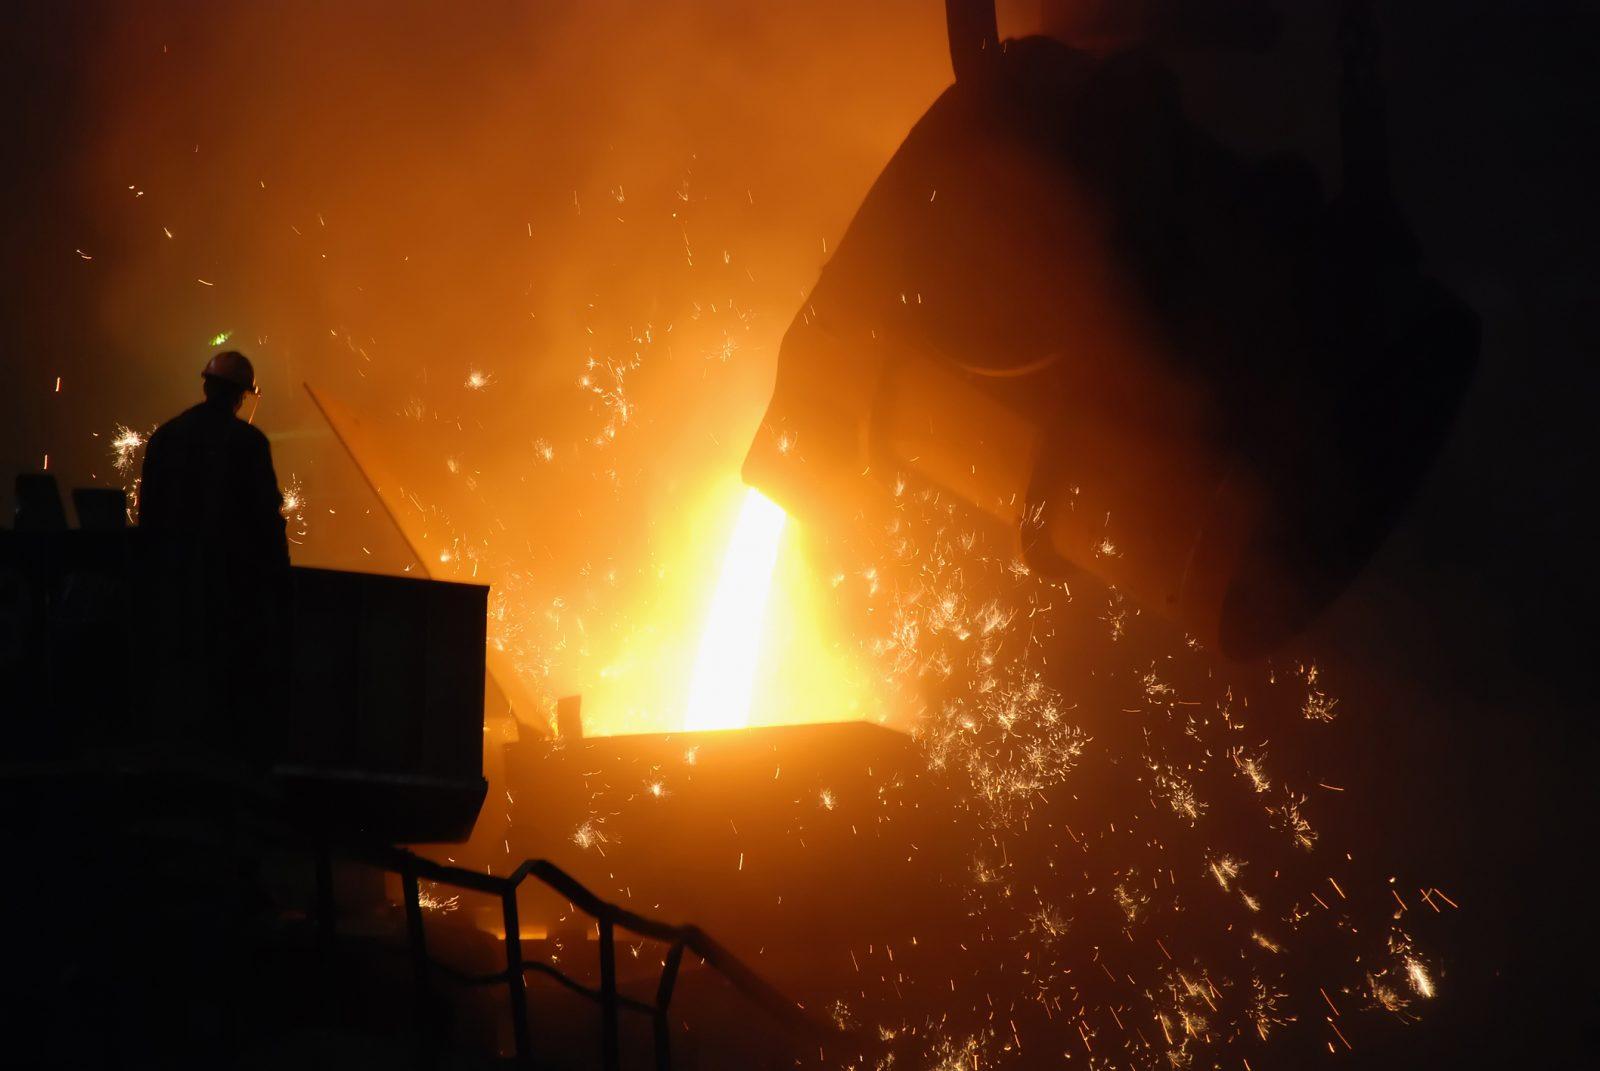 steel smelting factory